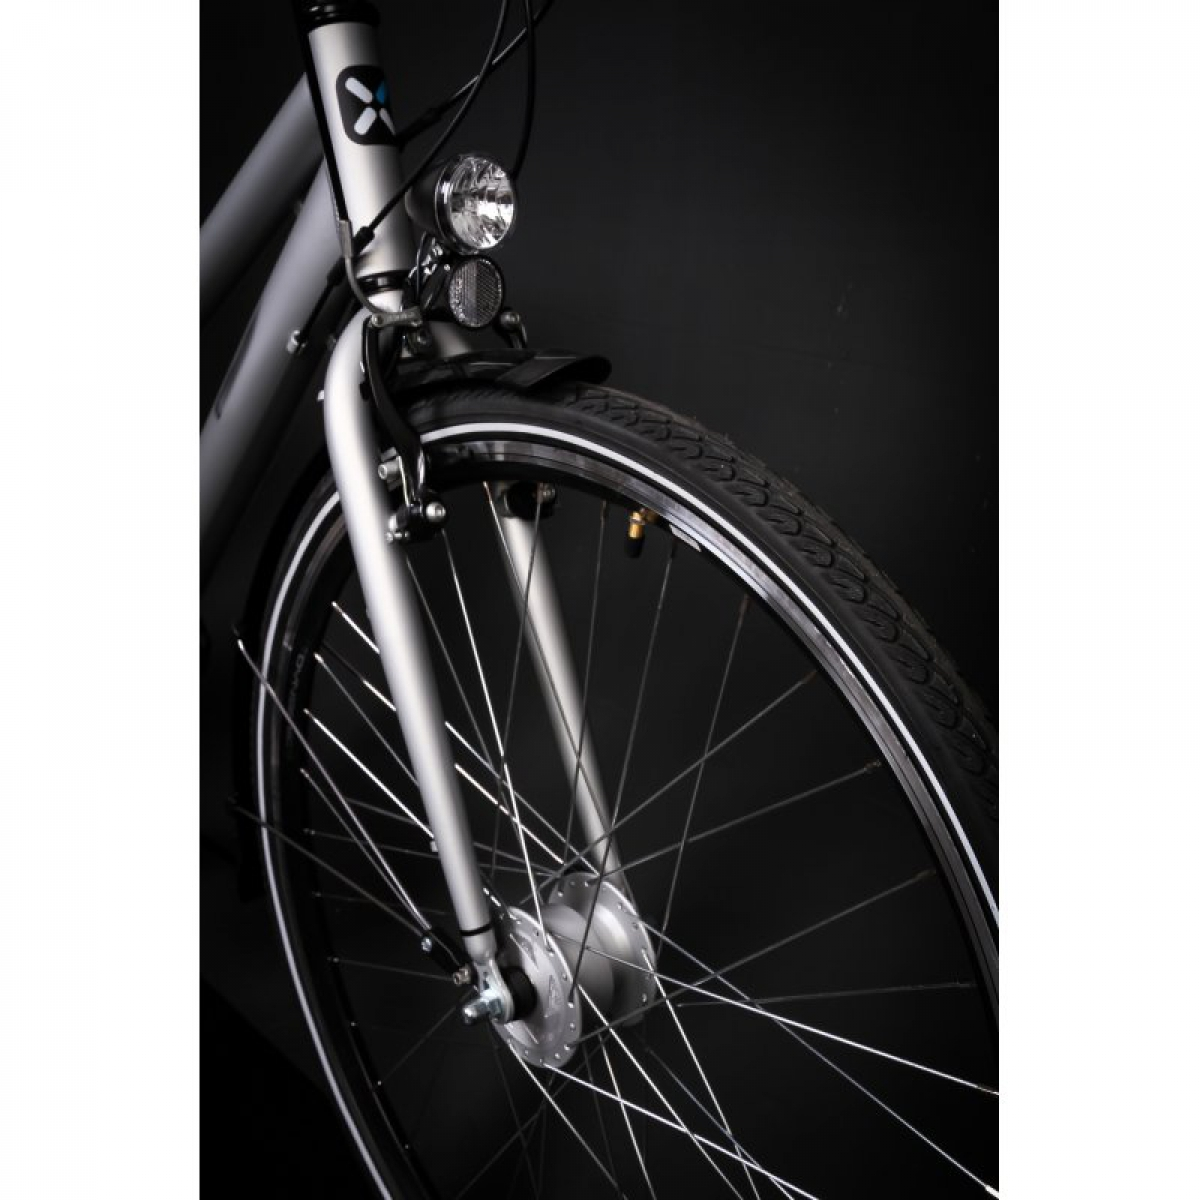 28 zoll leichtes alu mifa damen trekking fahrrad shimano. Black Bedroom Furniture Sets. Home Design Ideas